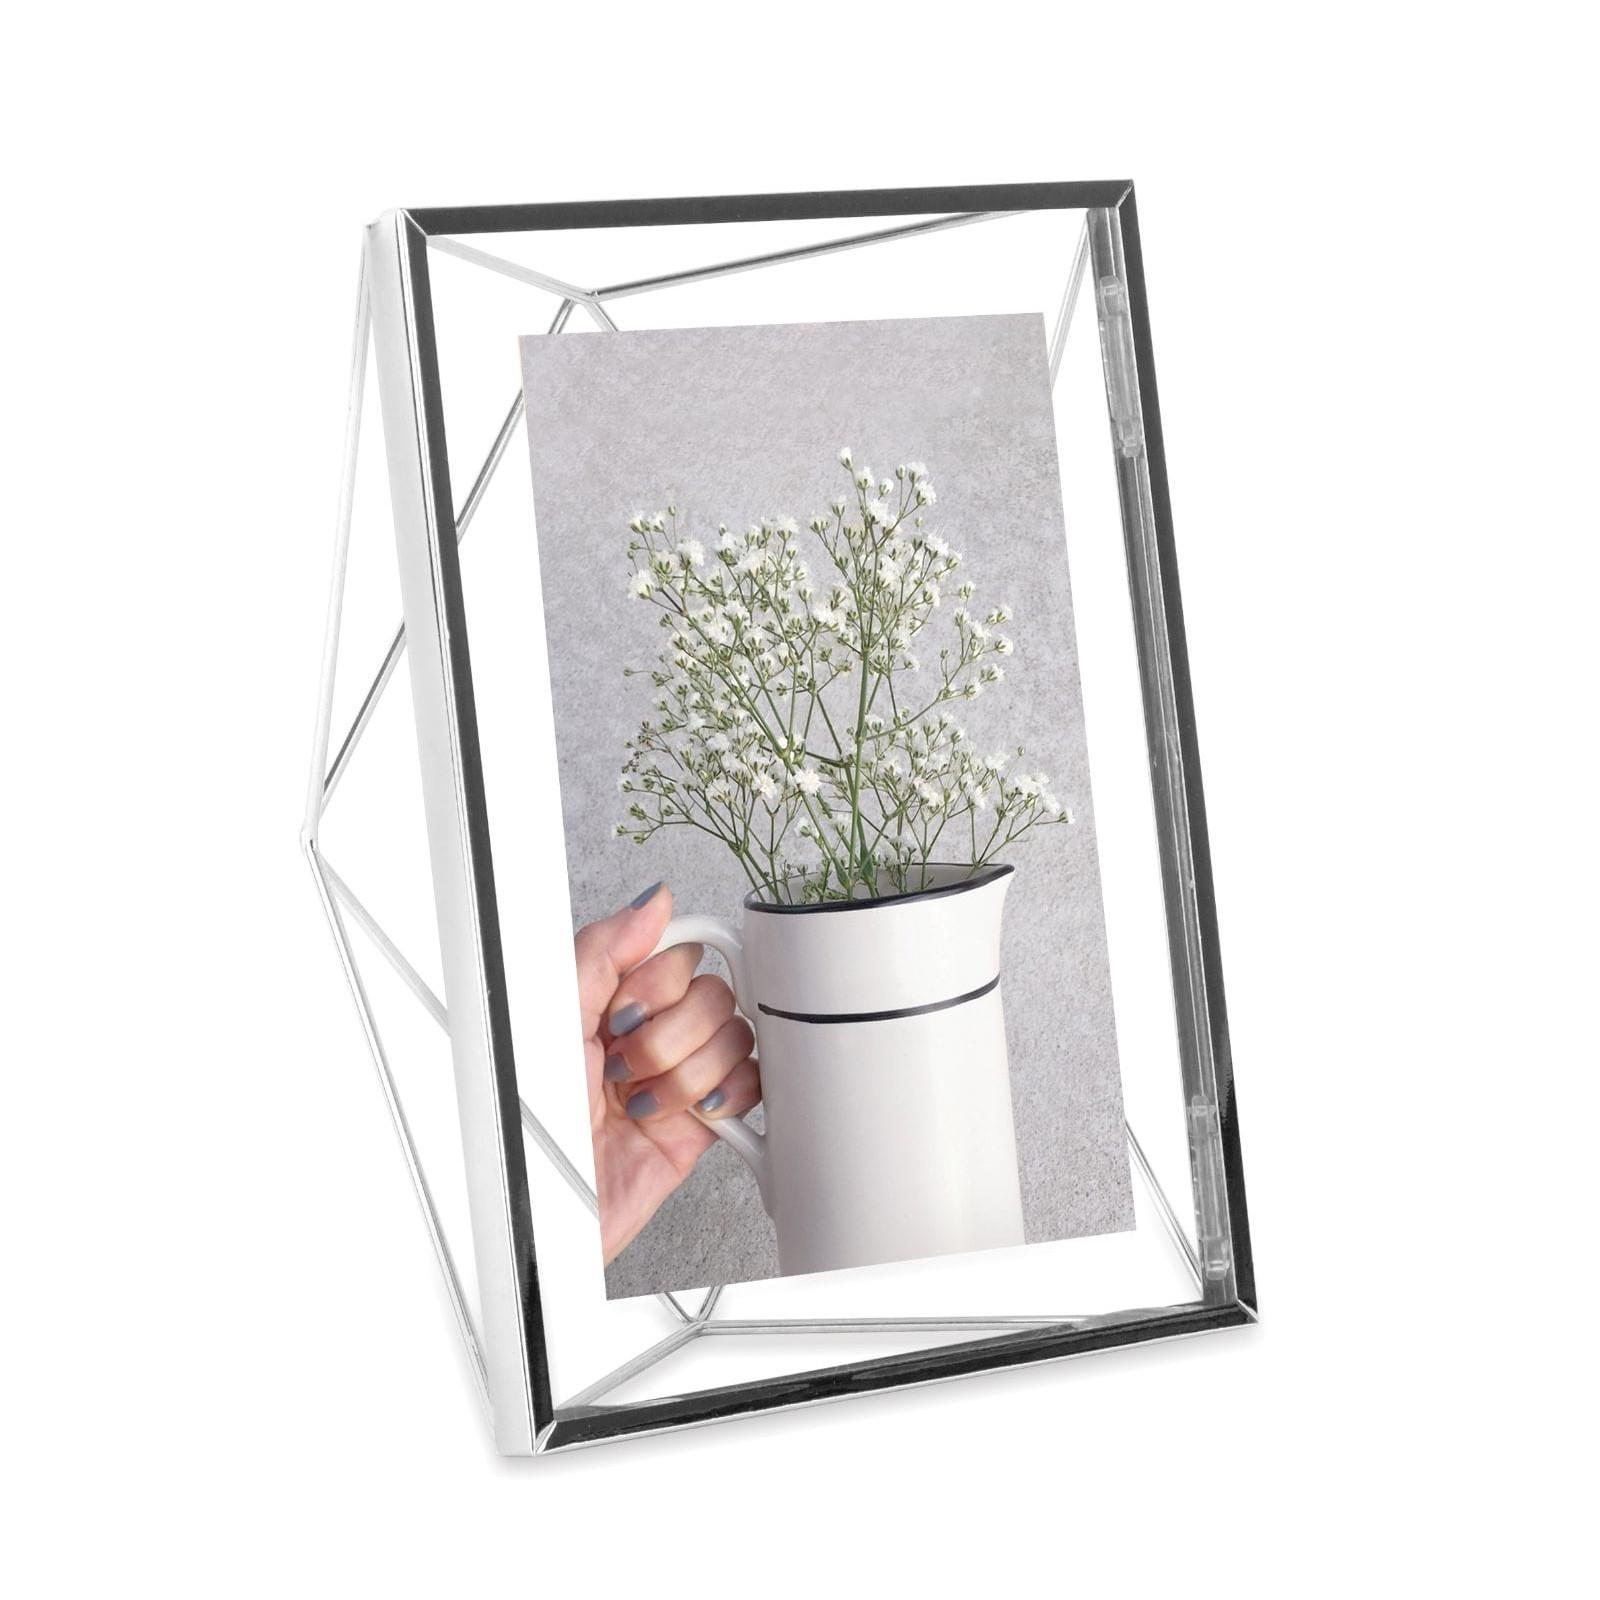 Prisma Photo Display 13 x 18 cm (Chrome) - Umbra